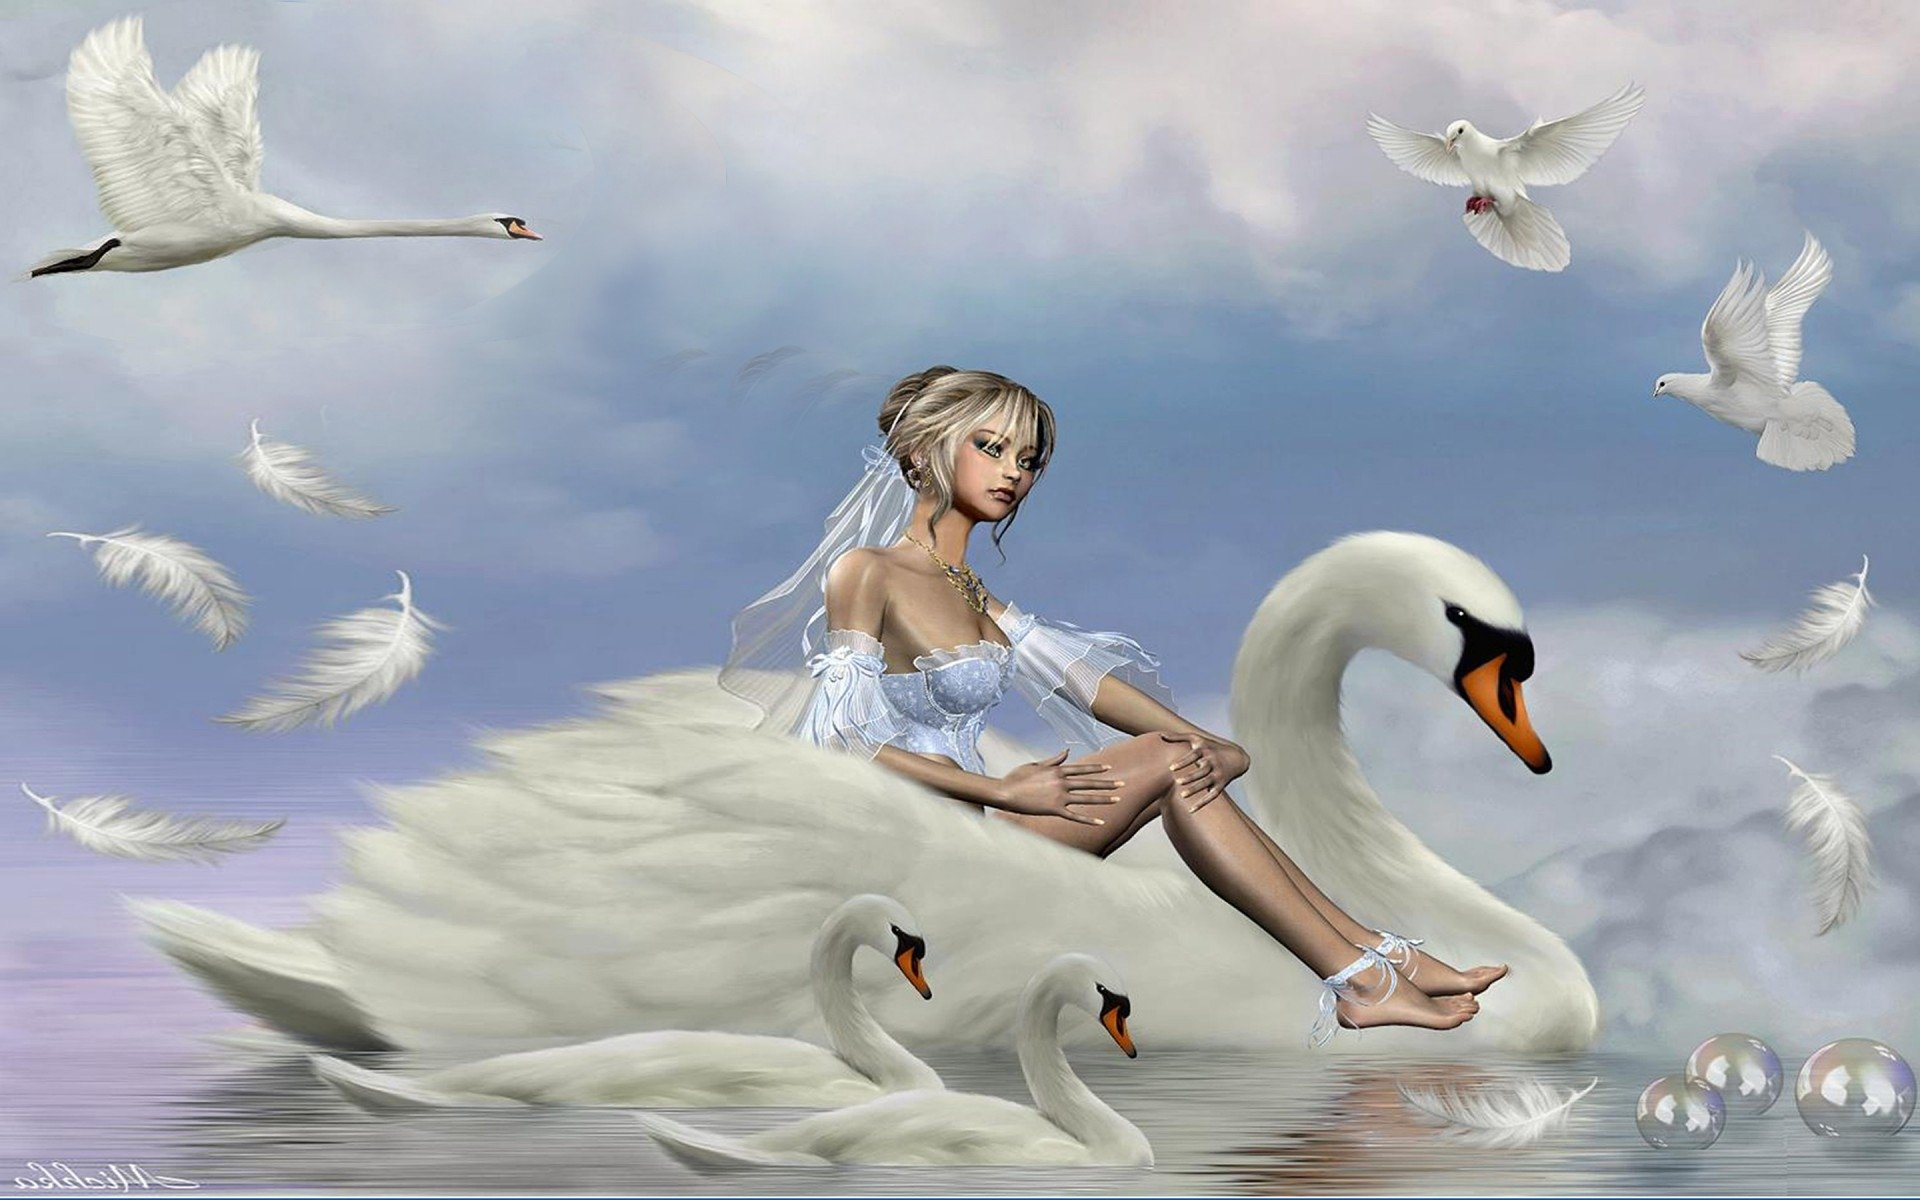 Swan Fantasy Girl Hd Wallpaper Background Image